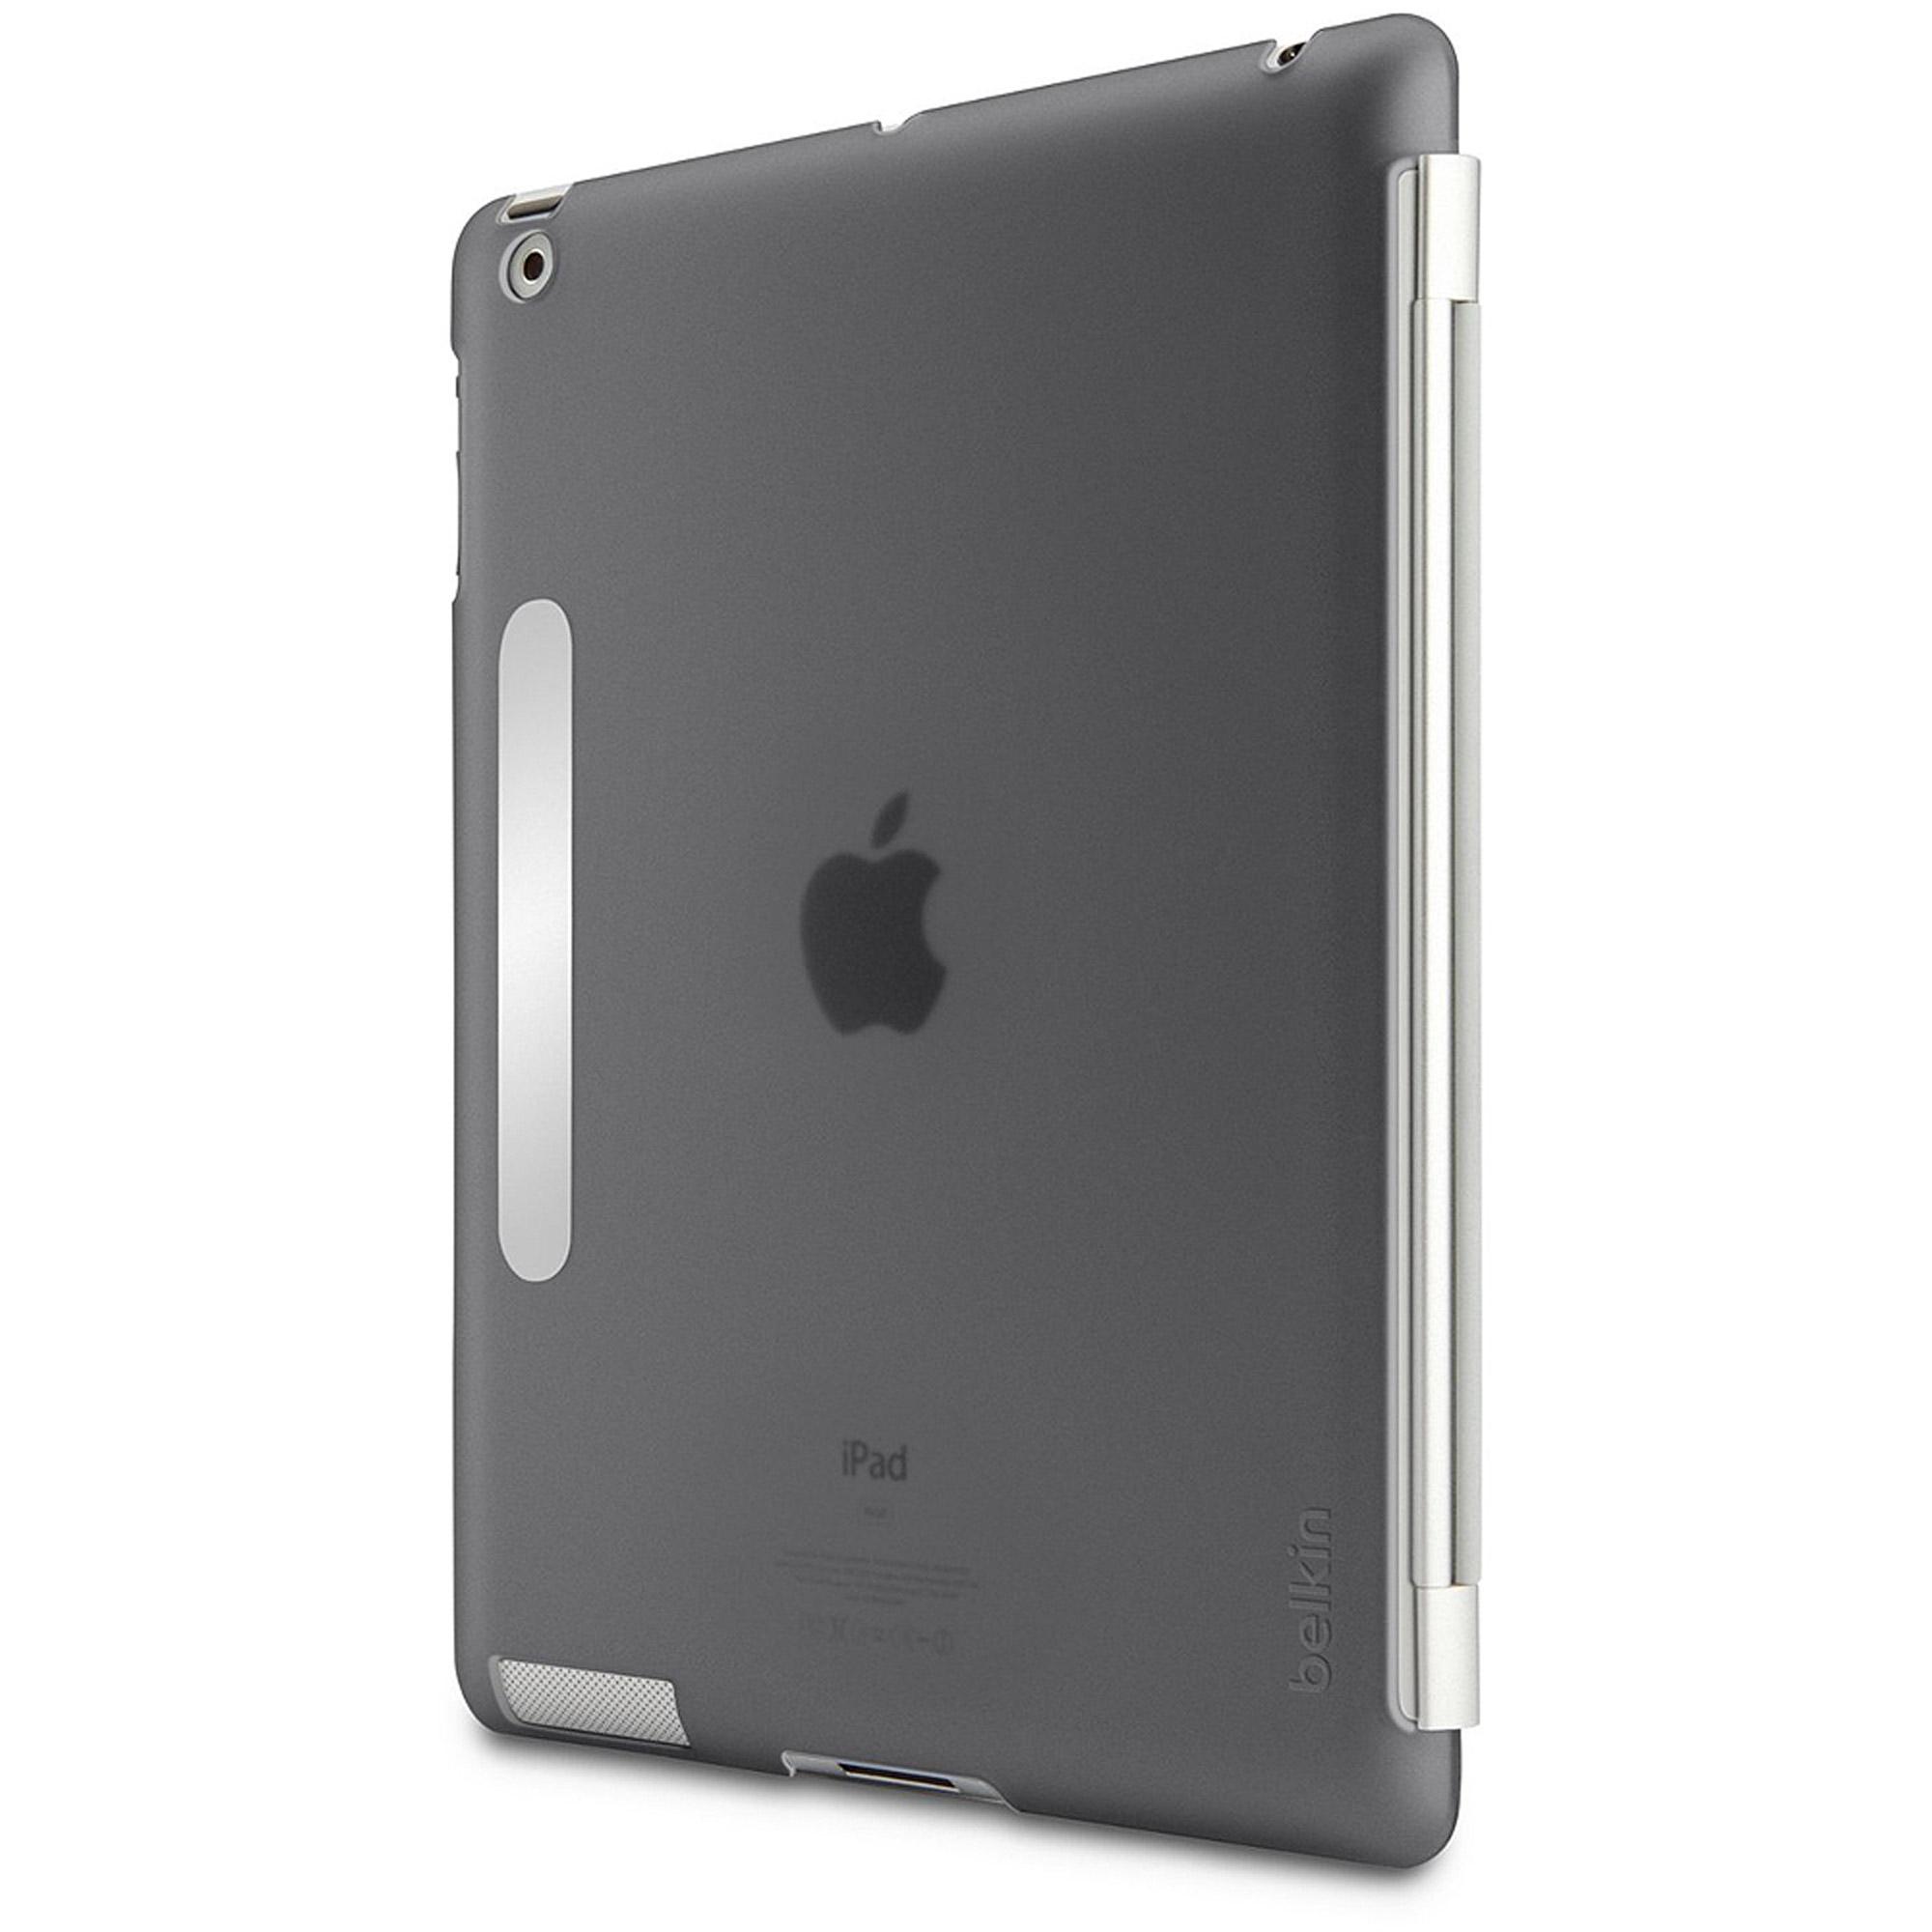 Belkin Snap Shield Secure - Case for web tablet - plastic - smoke - for Apple iP